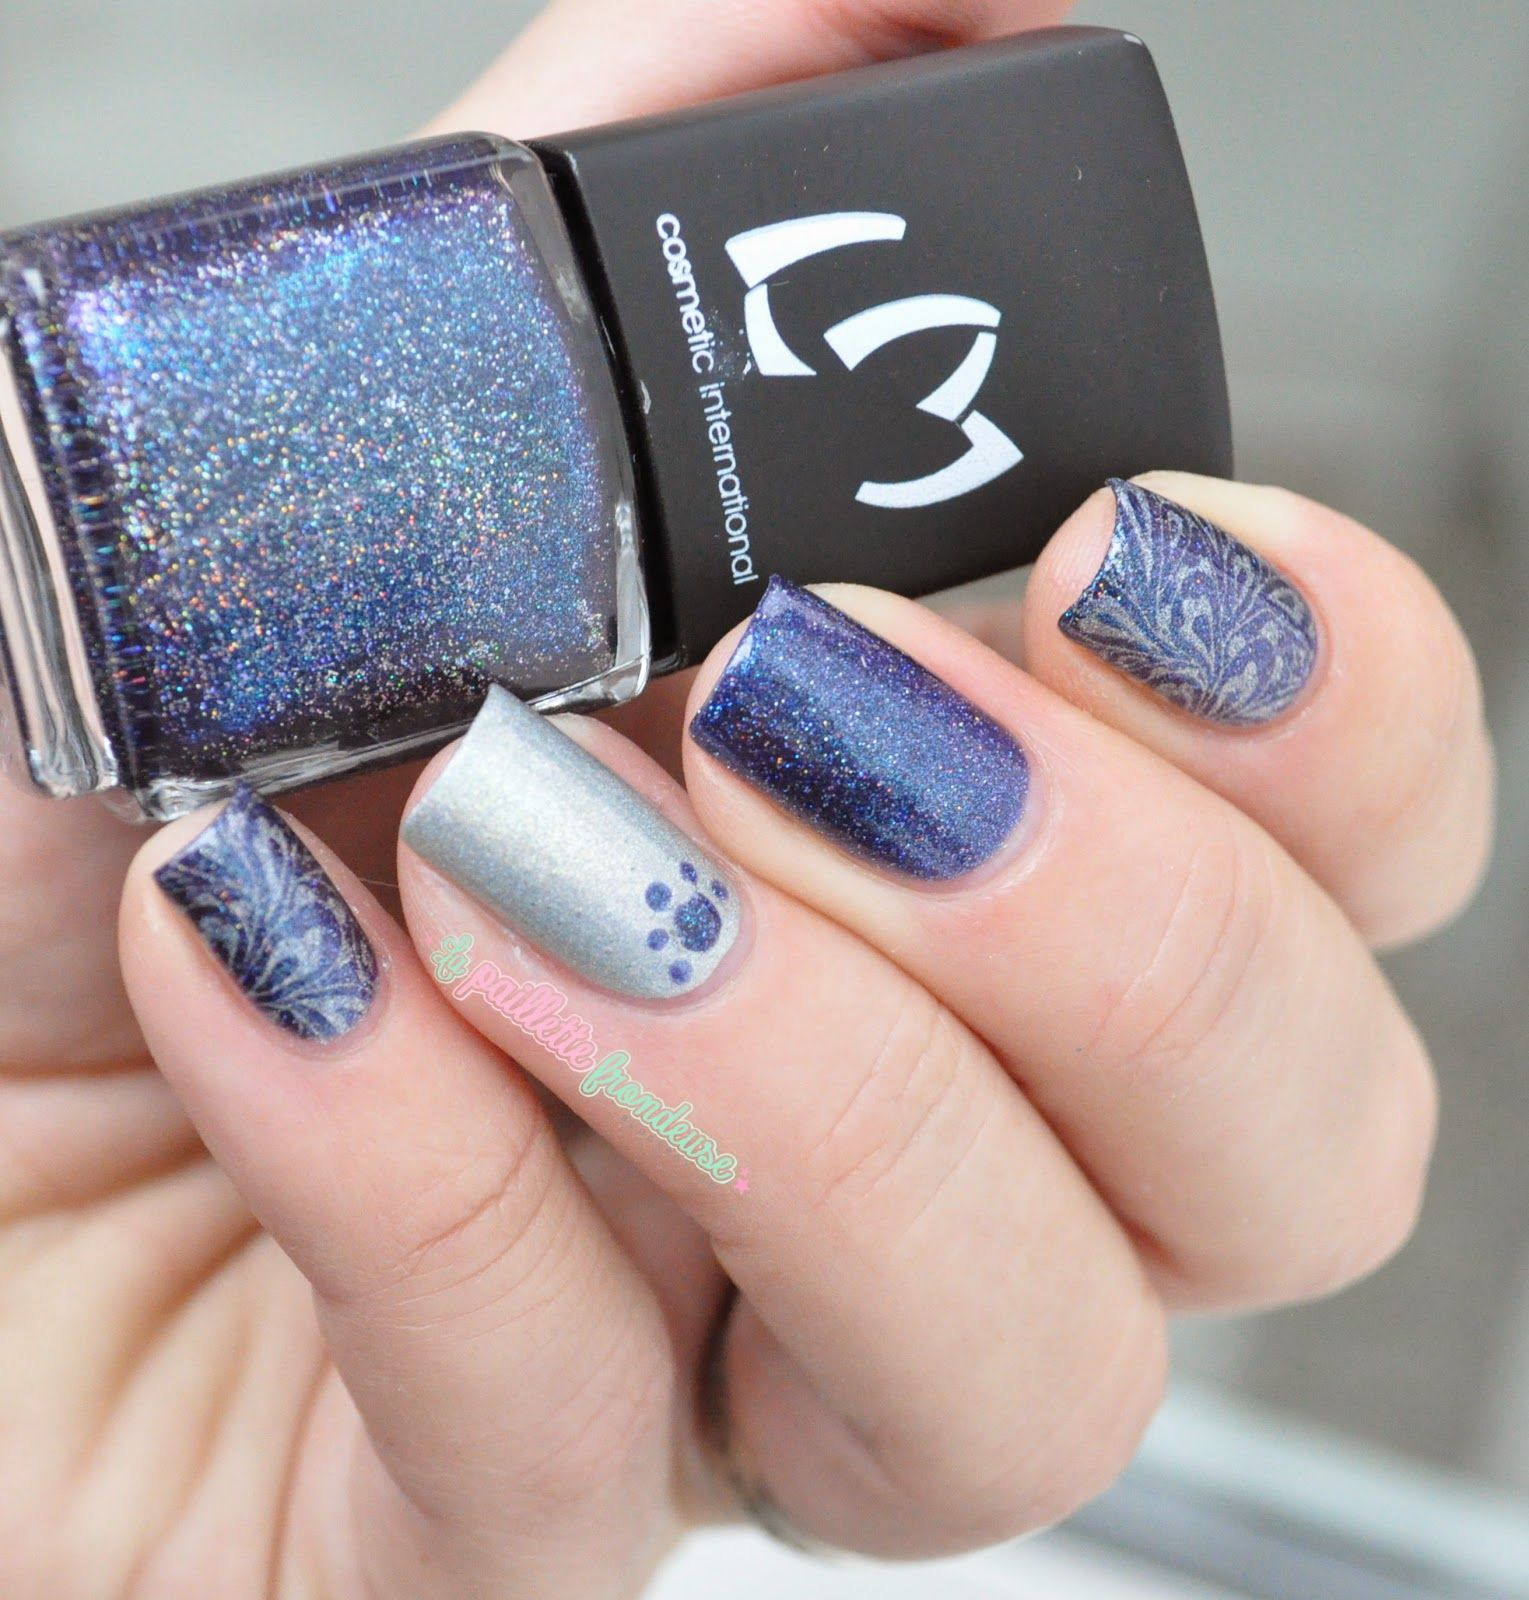 CHERRY NAIL ART - Blog mode beauté: Vernis Lm cosmetic